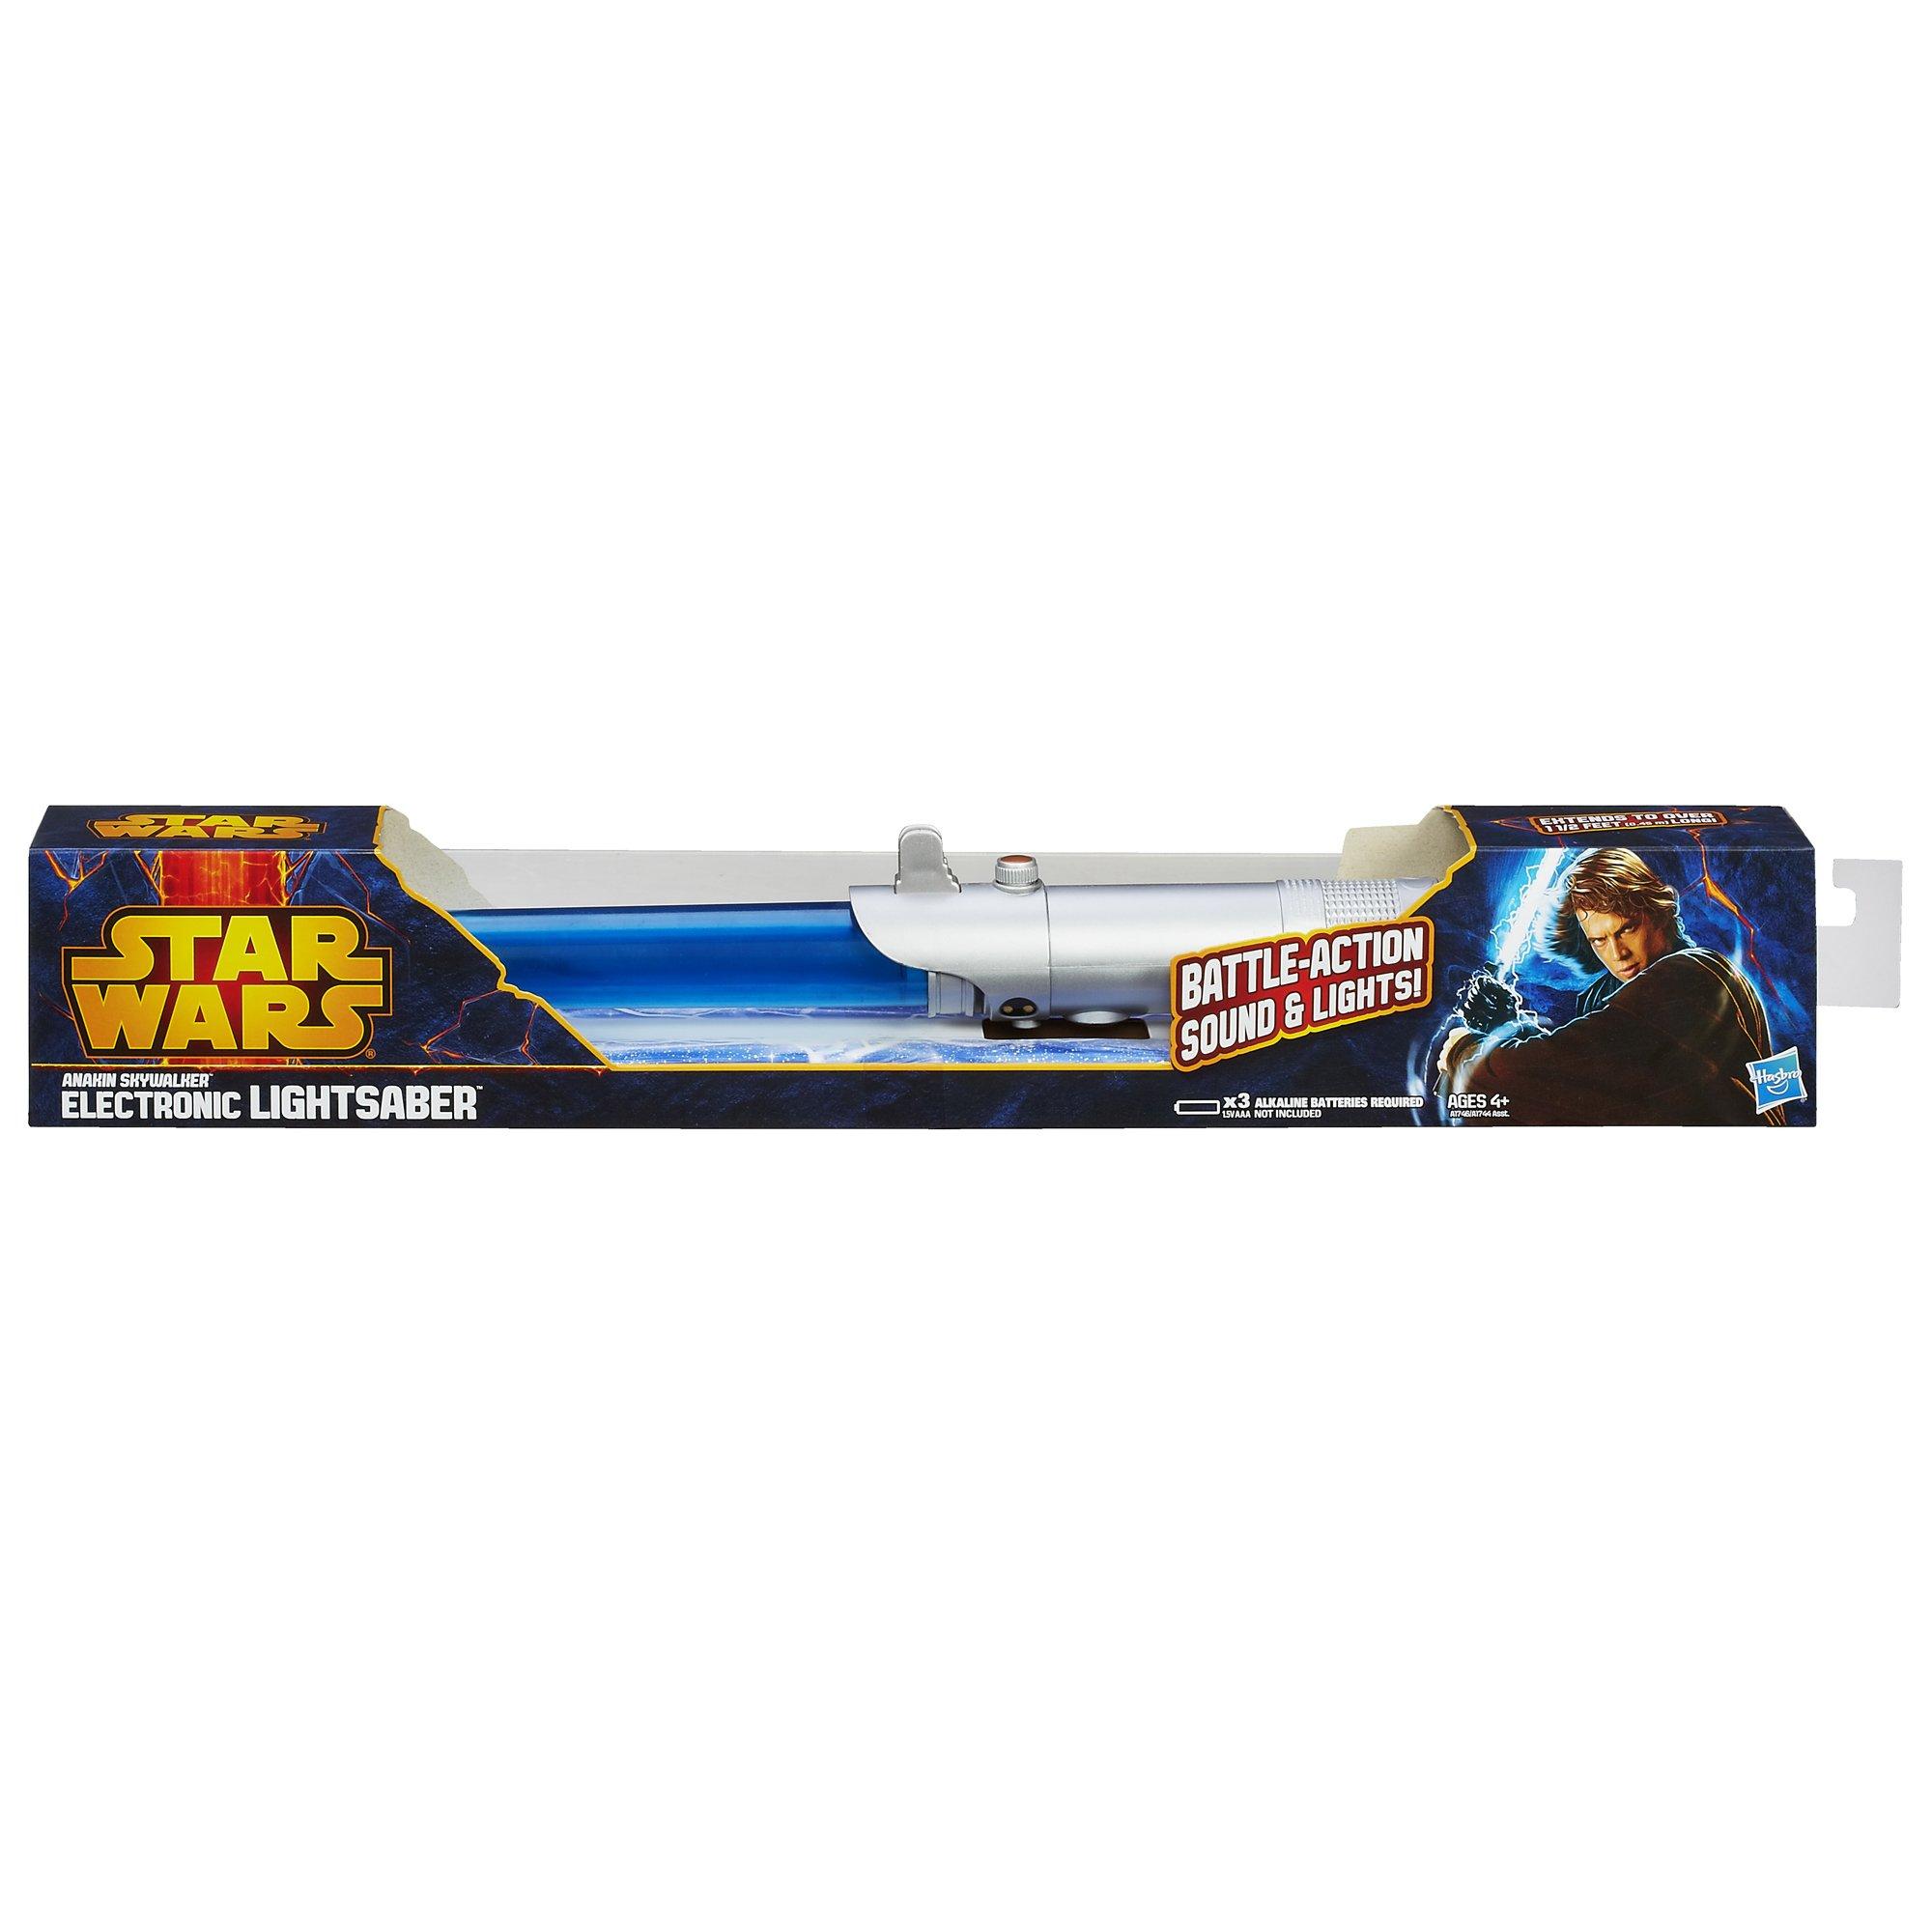 Star Wars Anakin Skywalker Electronic Lightsaber Toy by Star Wars (Image #2)